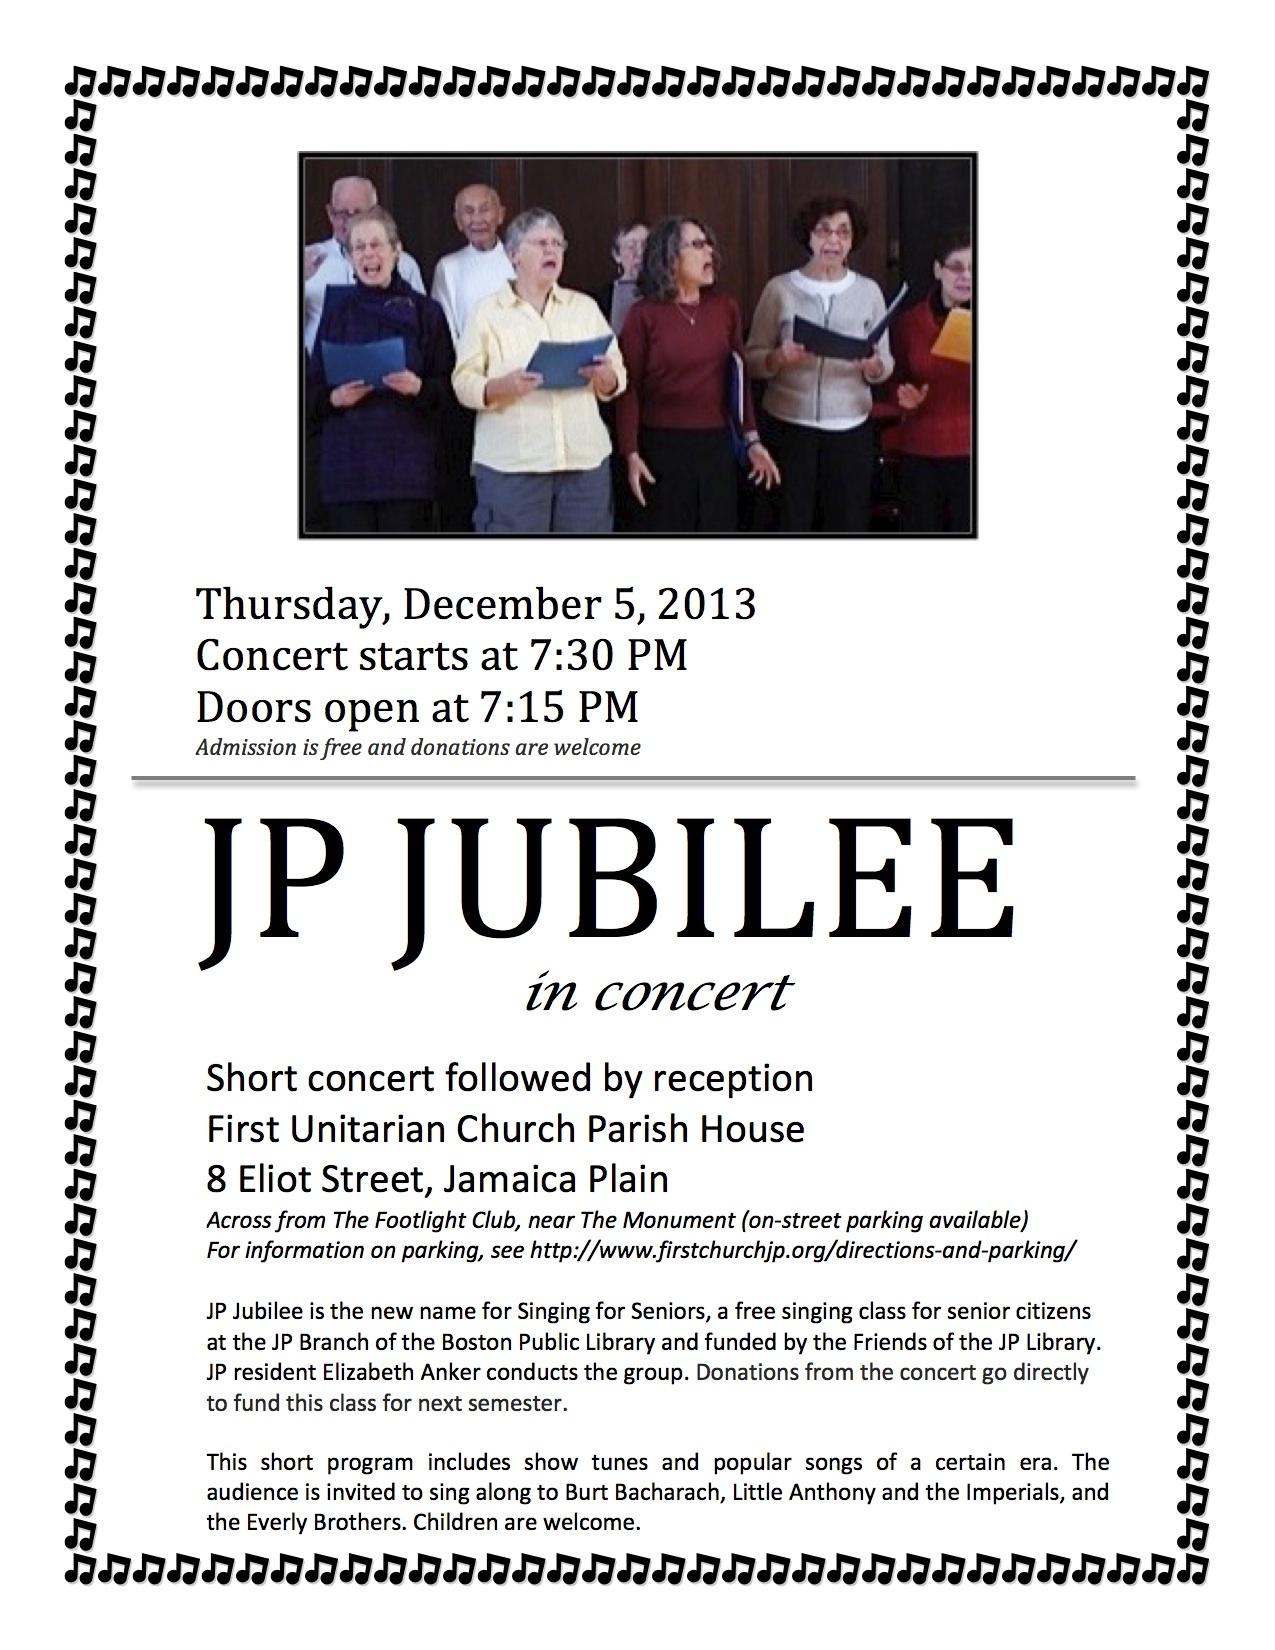 JP Jubilee Concert | Jamaica Plain, MA Patch